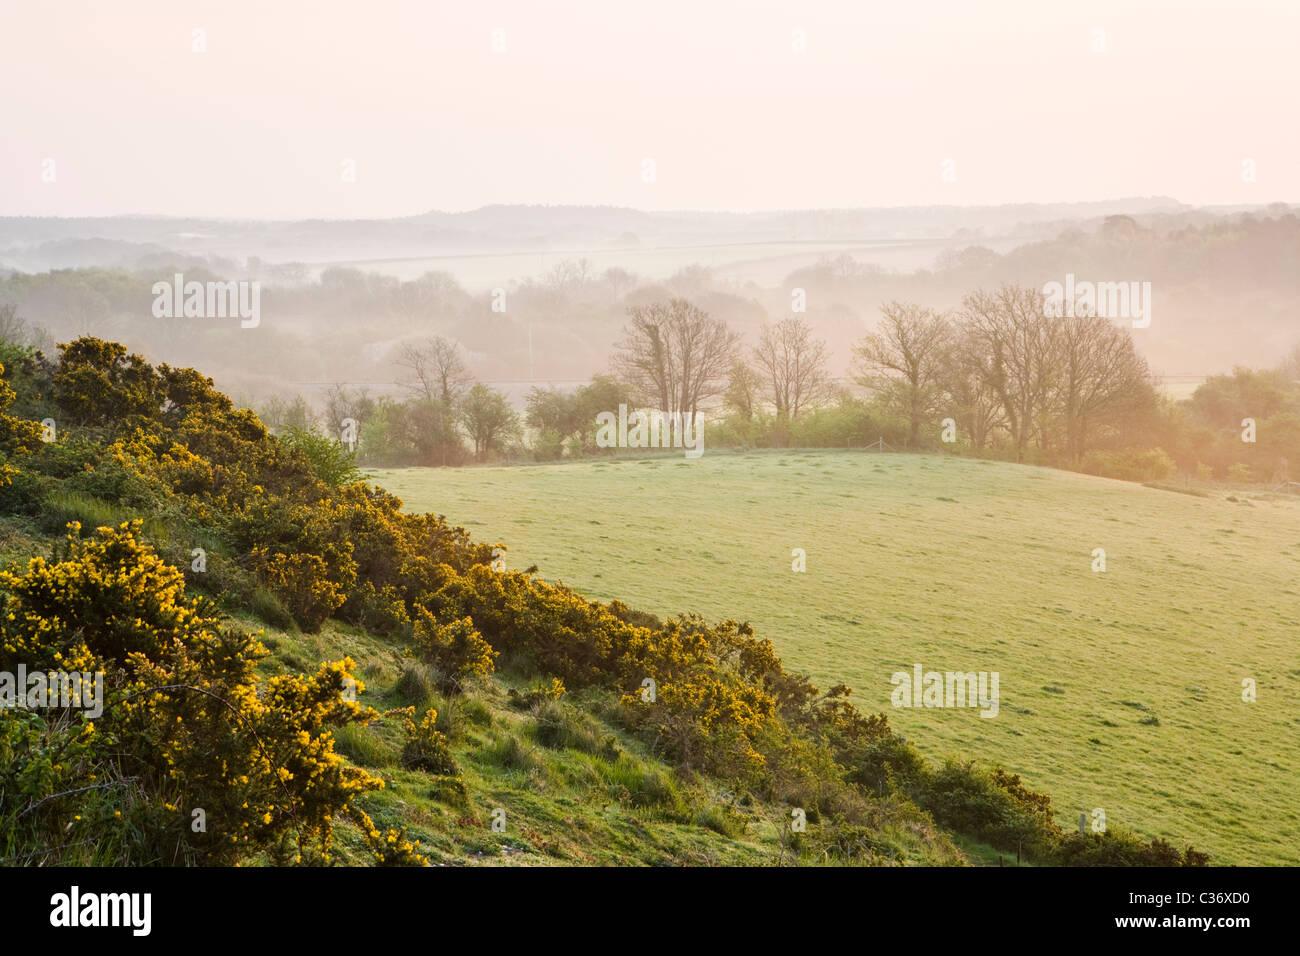 Misty dawn in early spring near Corfe Castle village, Dorset, UK - Stock Image